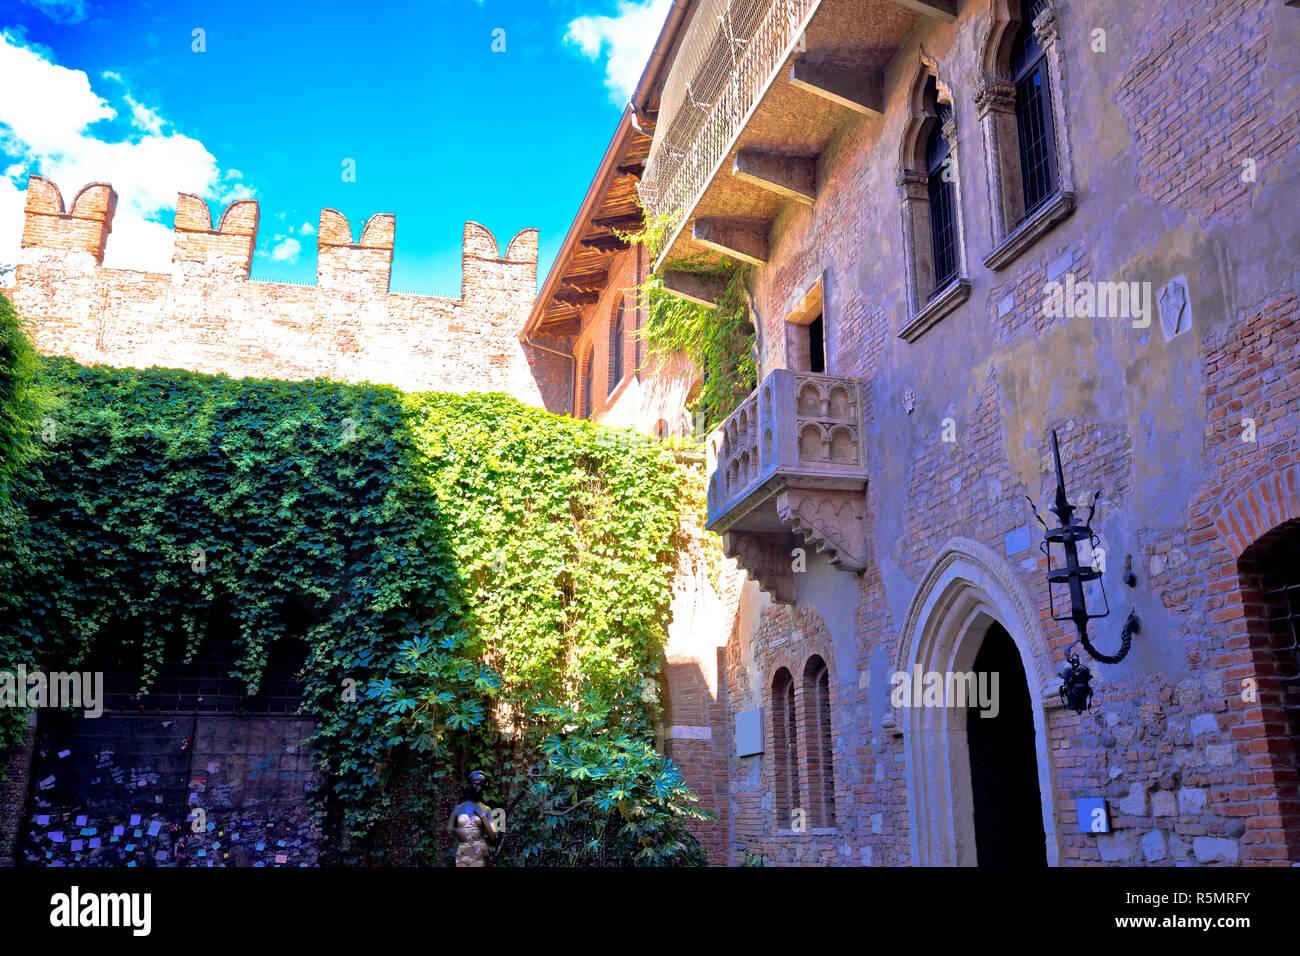 Patio and balcony of Romeo and Juliet house in Verona Stock Photo